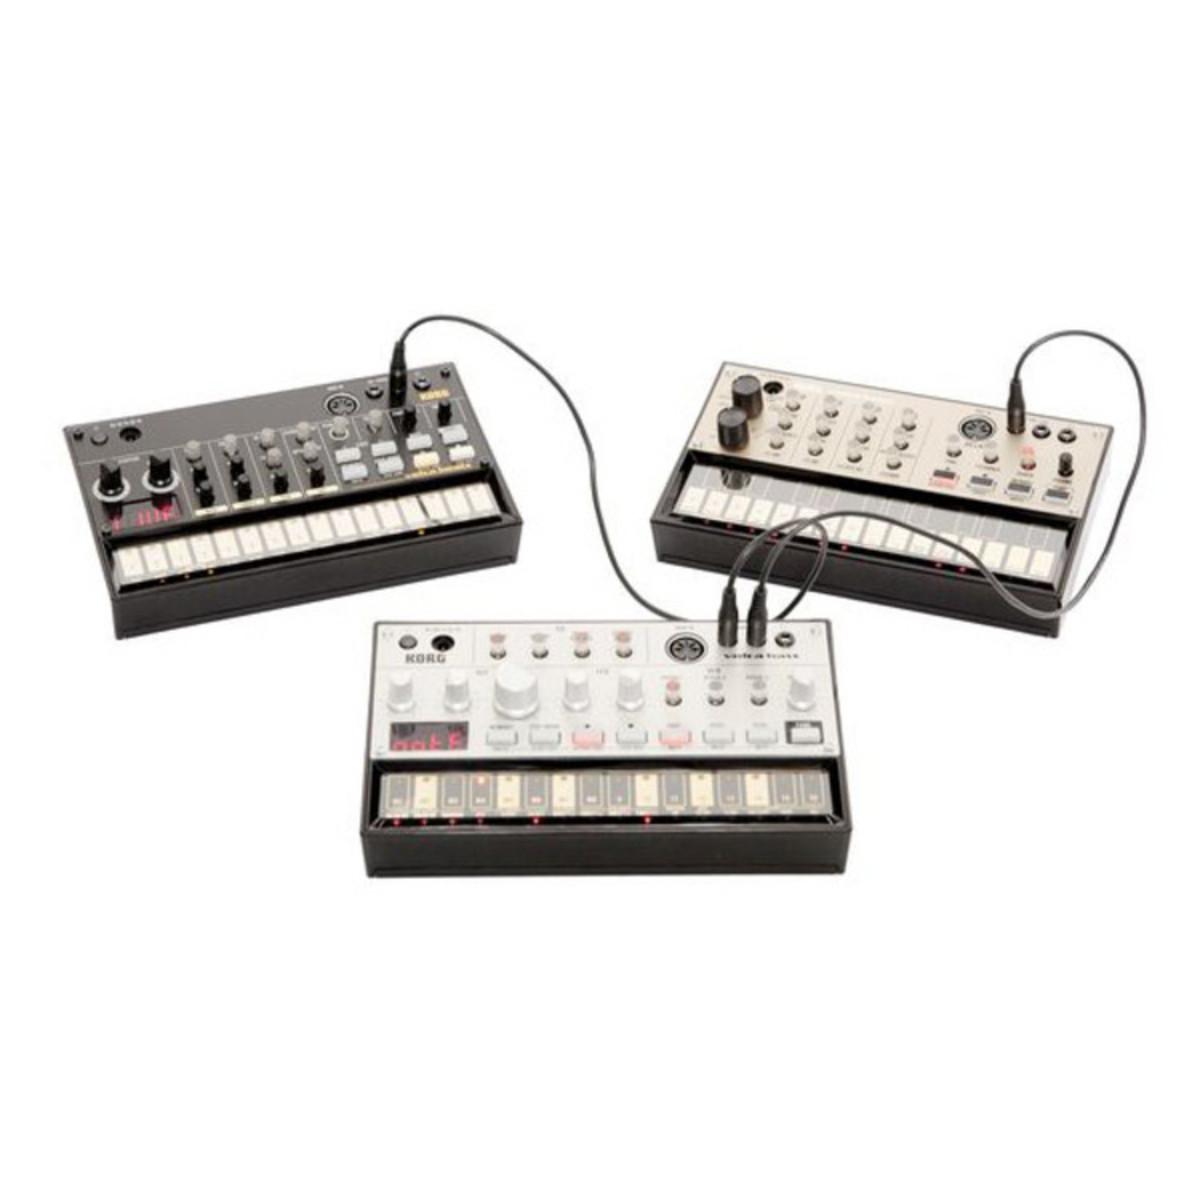 Image of Korg Volca Ult. Analog Machine Bundle - Bass Beats and Keys